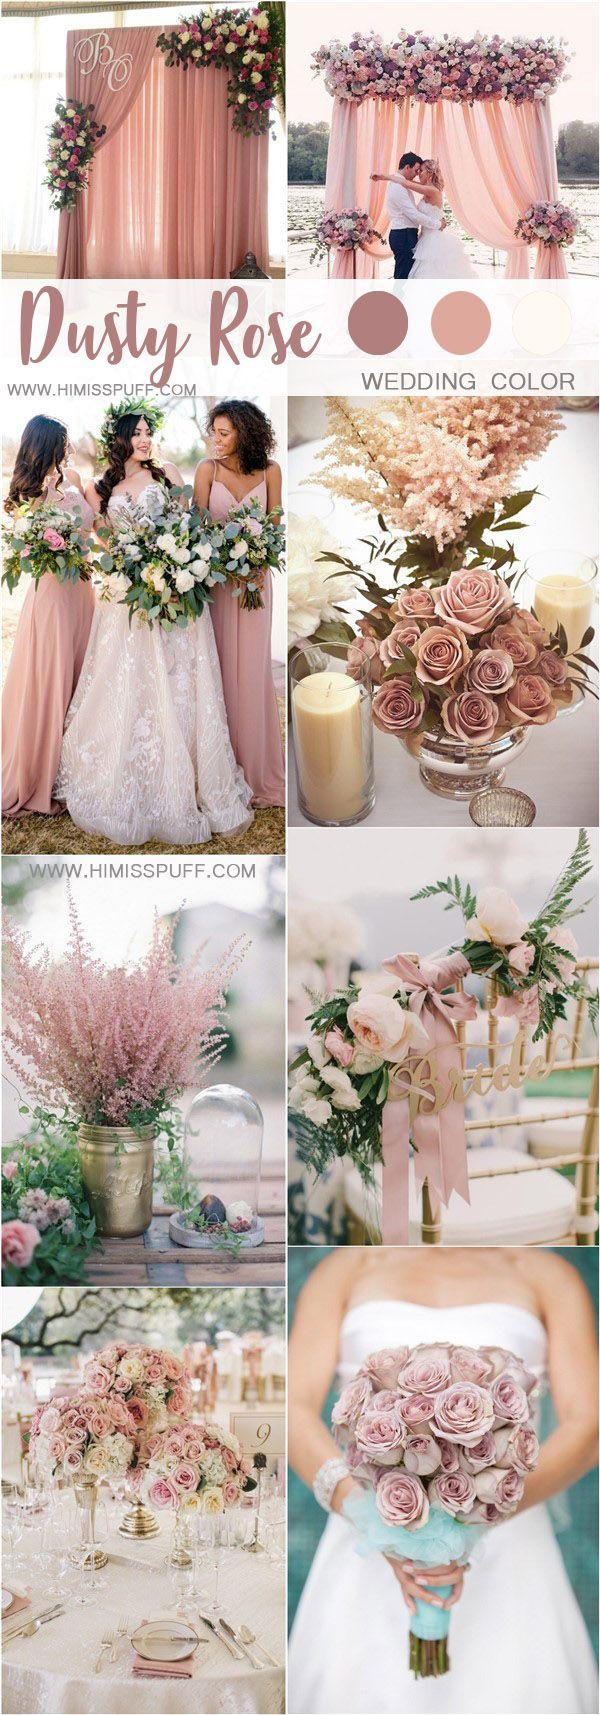 dusty rose wedding color ideas #weddings explore Pinterest